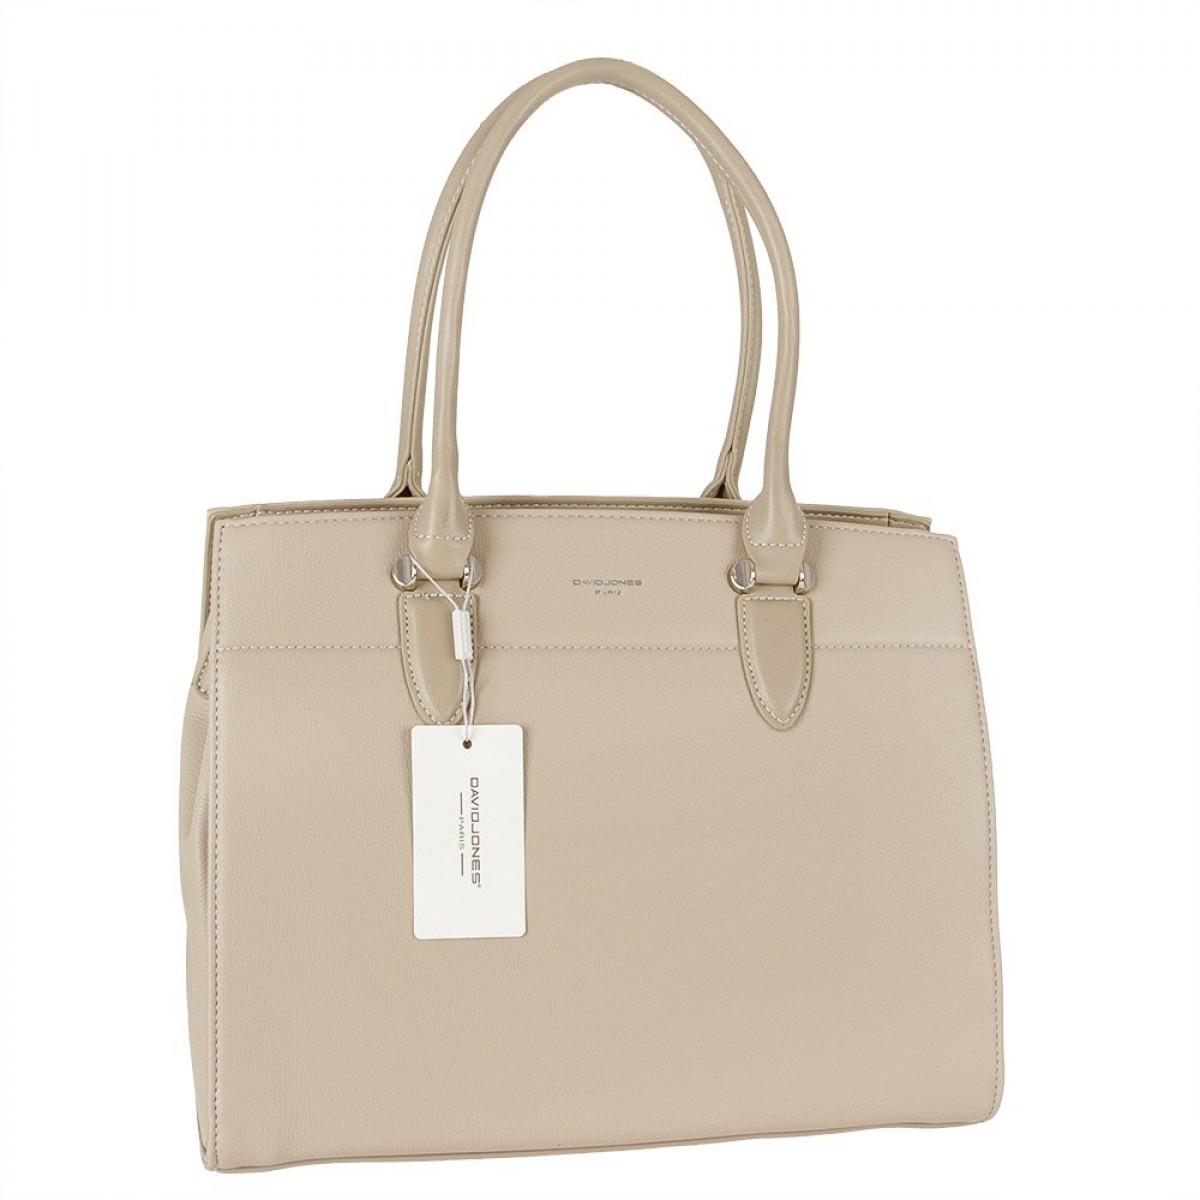 Жіноча сумка David Jones  CM5626 L.CAMEL